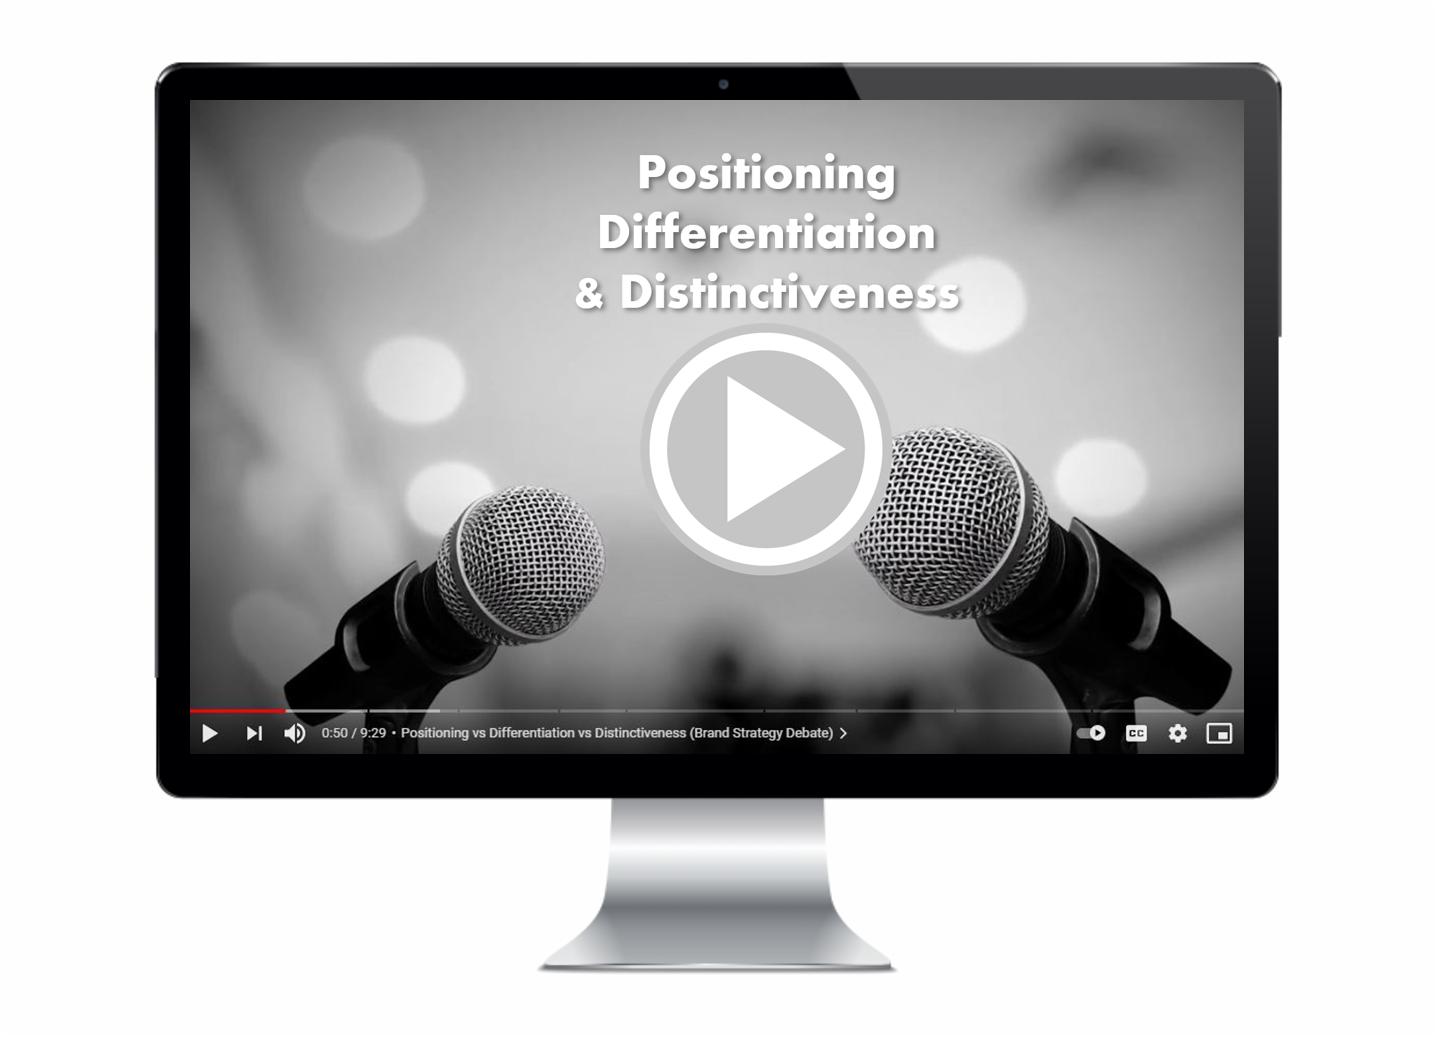 Positioning vs Differentiation vs Distinctiveness